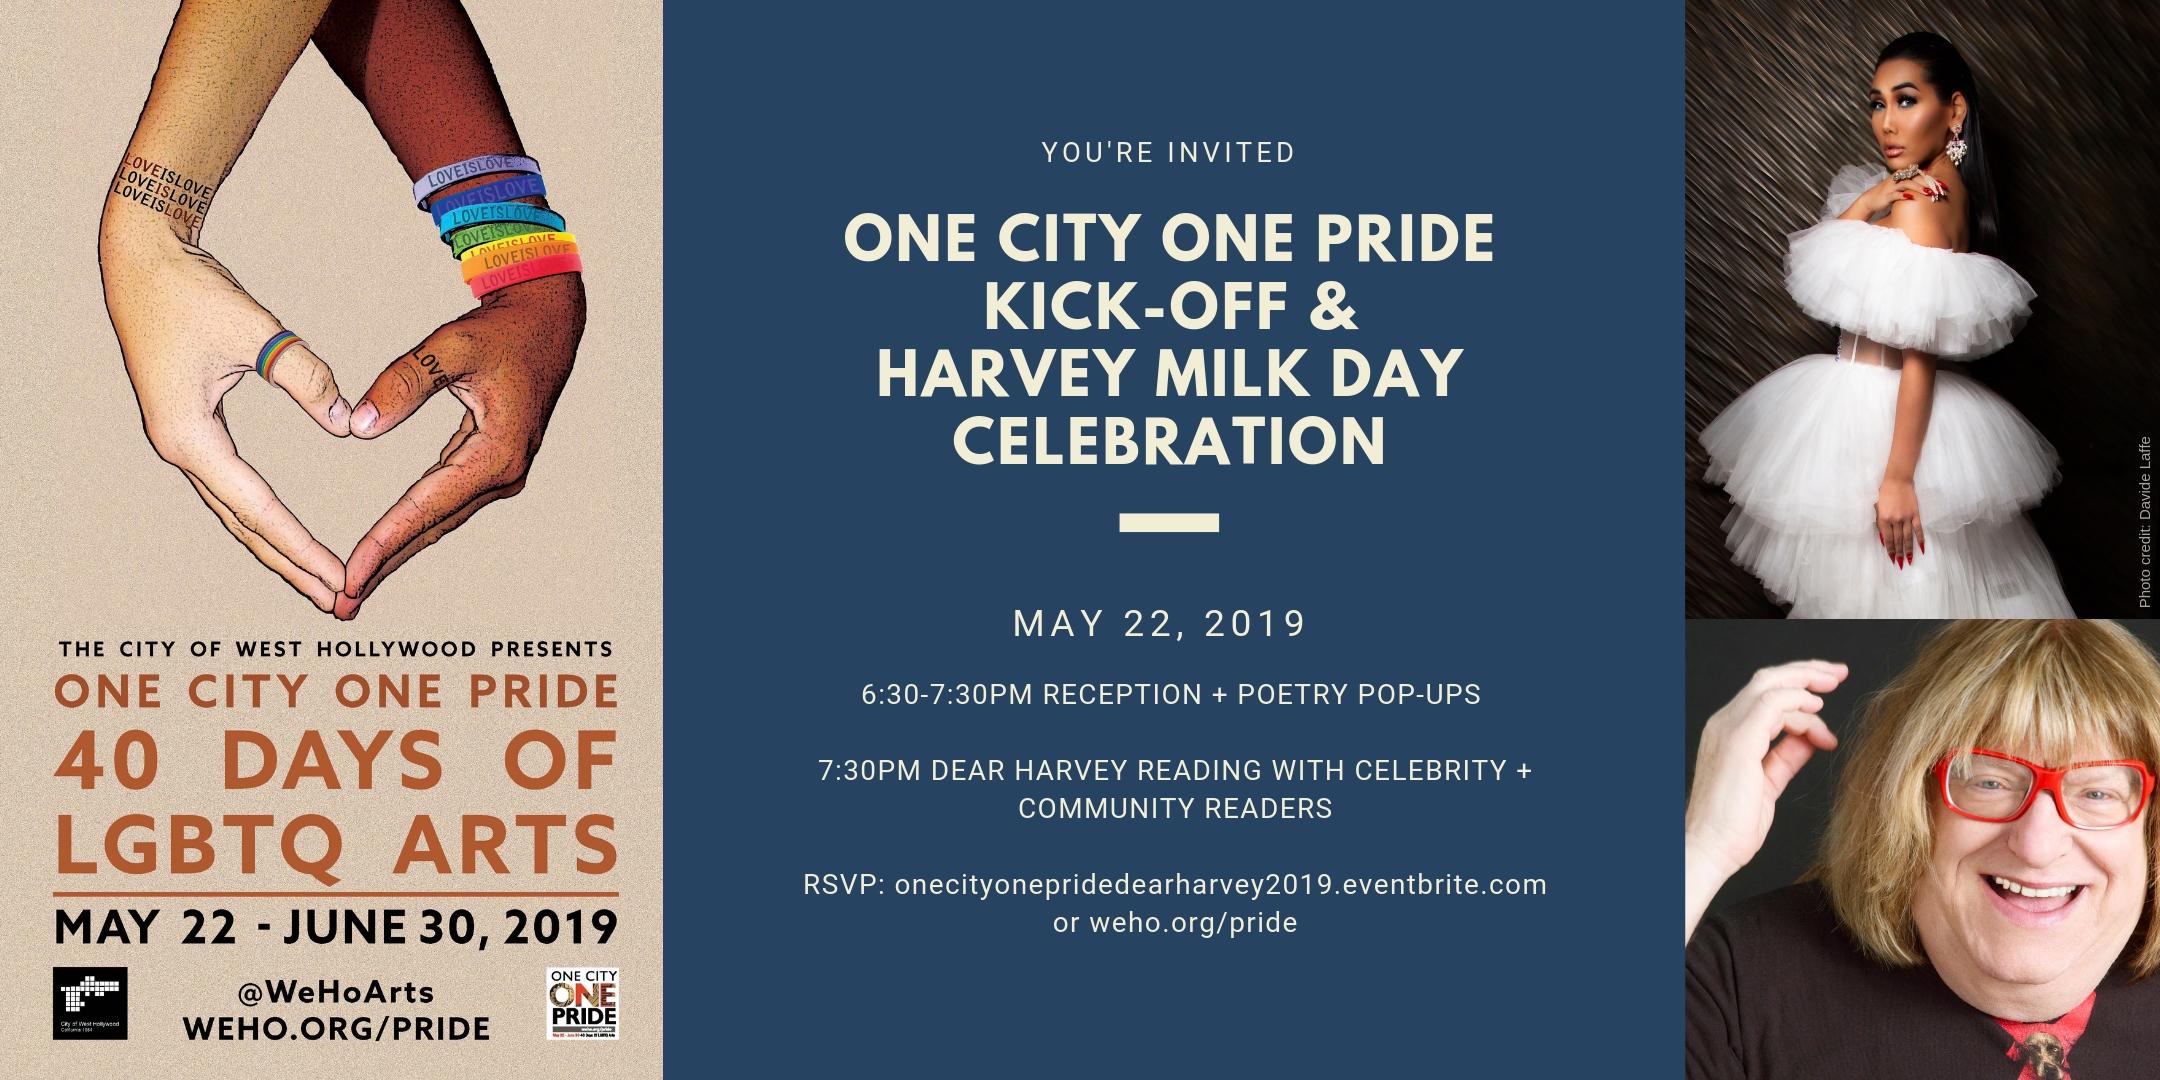 5-22-19 ONE CITY ONE PRIDE KICK-OFF & HARVEY MILK DAY CELEBRATION Event image.jpg